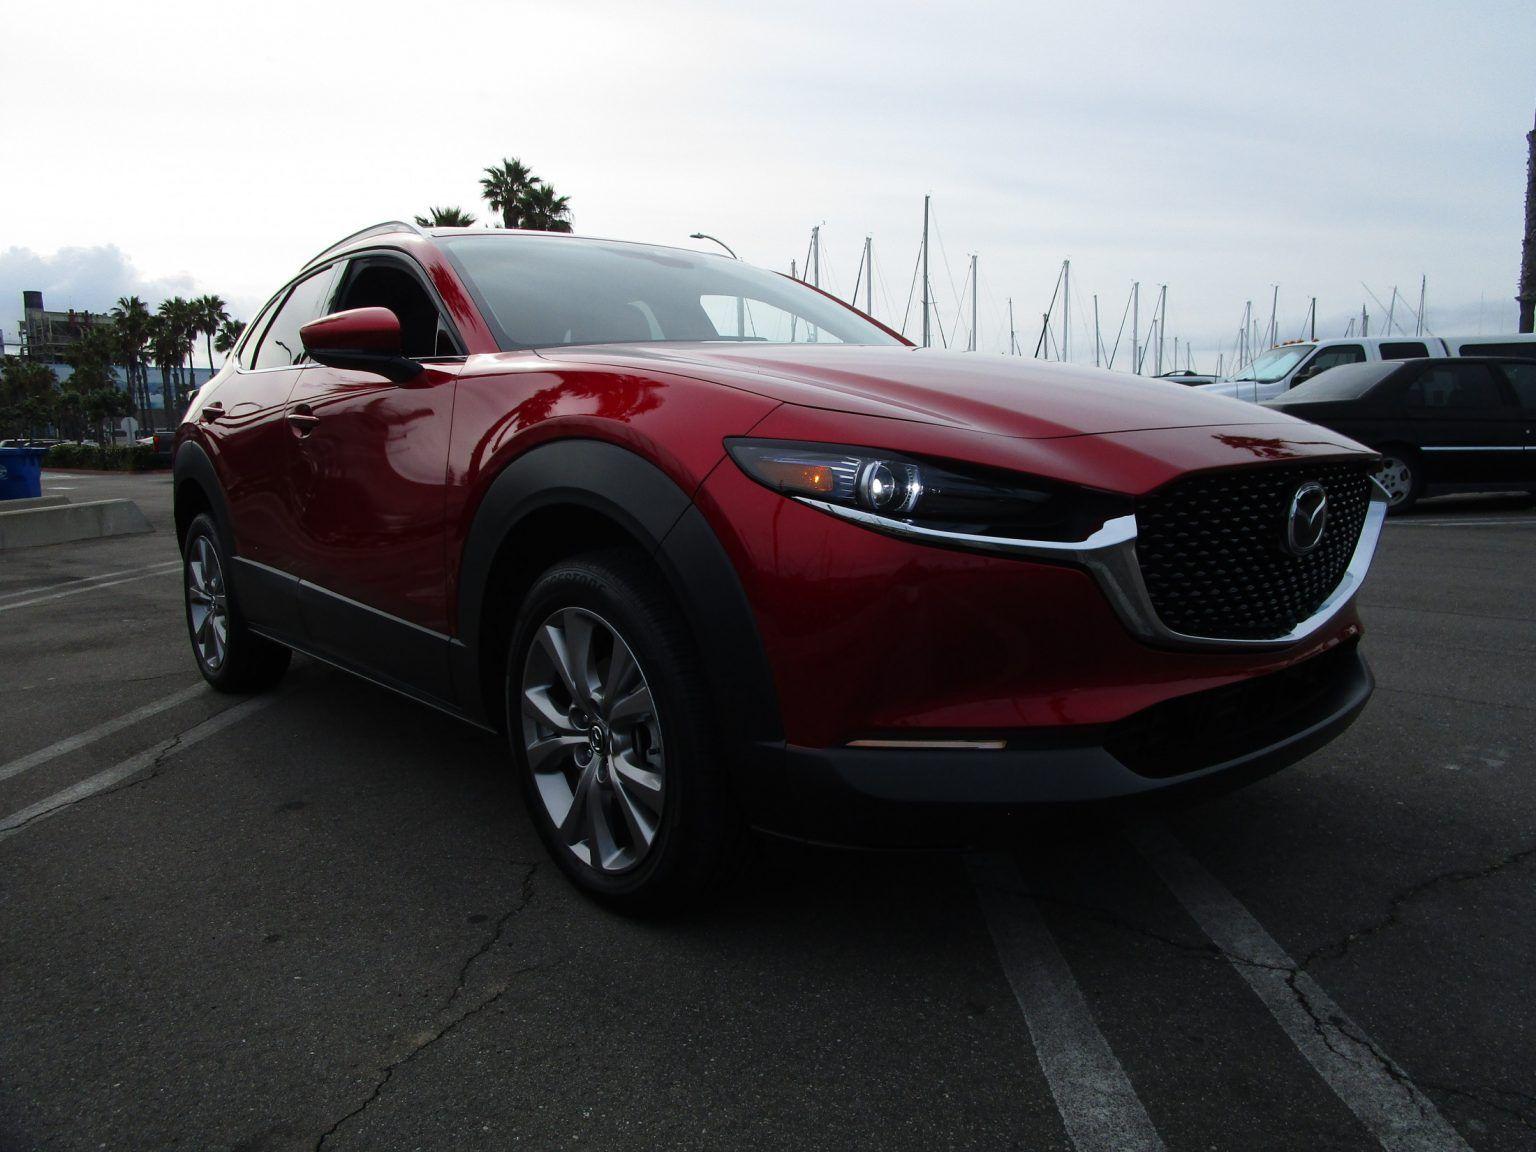 Img 2591 Latest Cars Mazda Toyota Usa